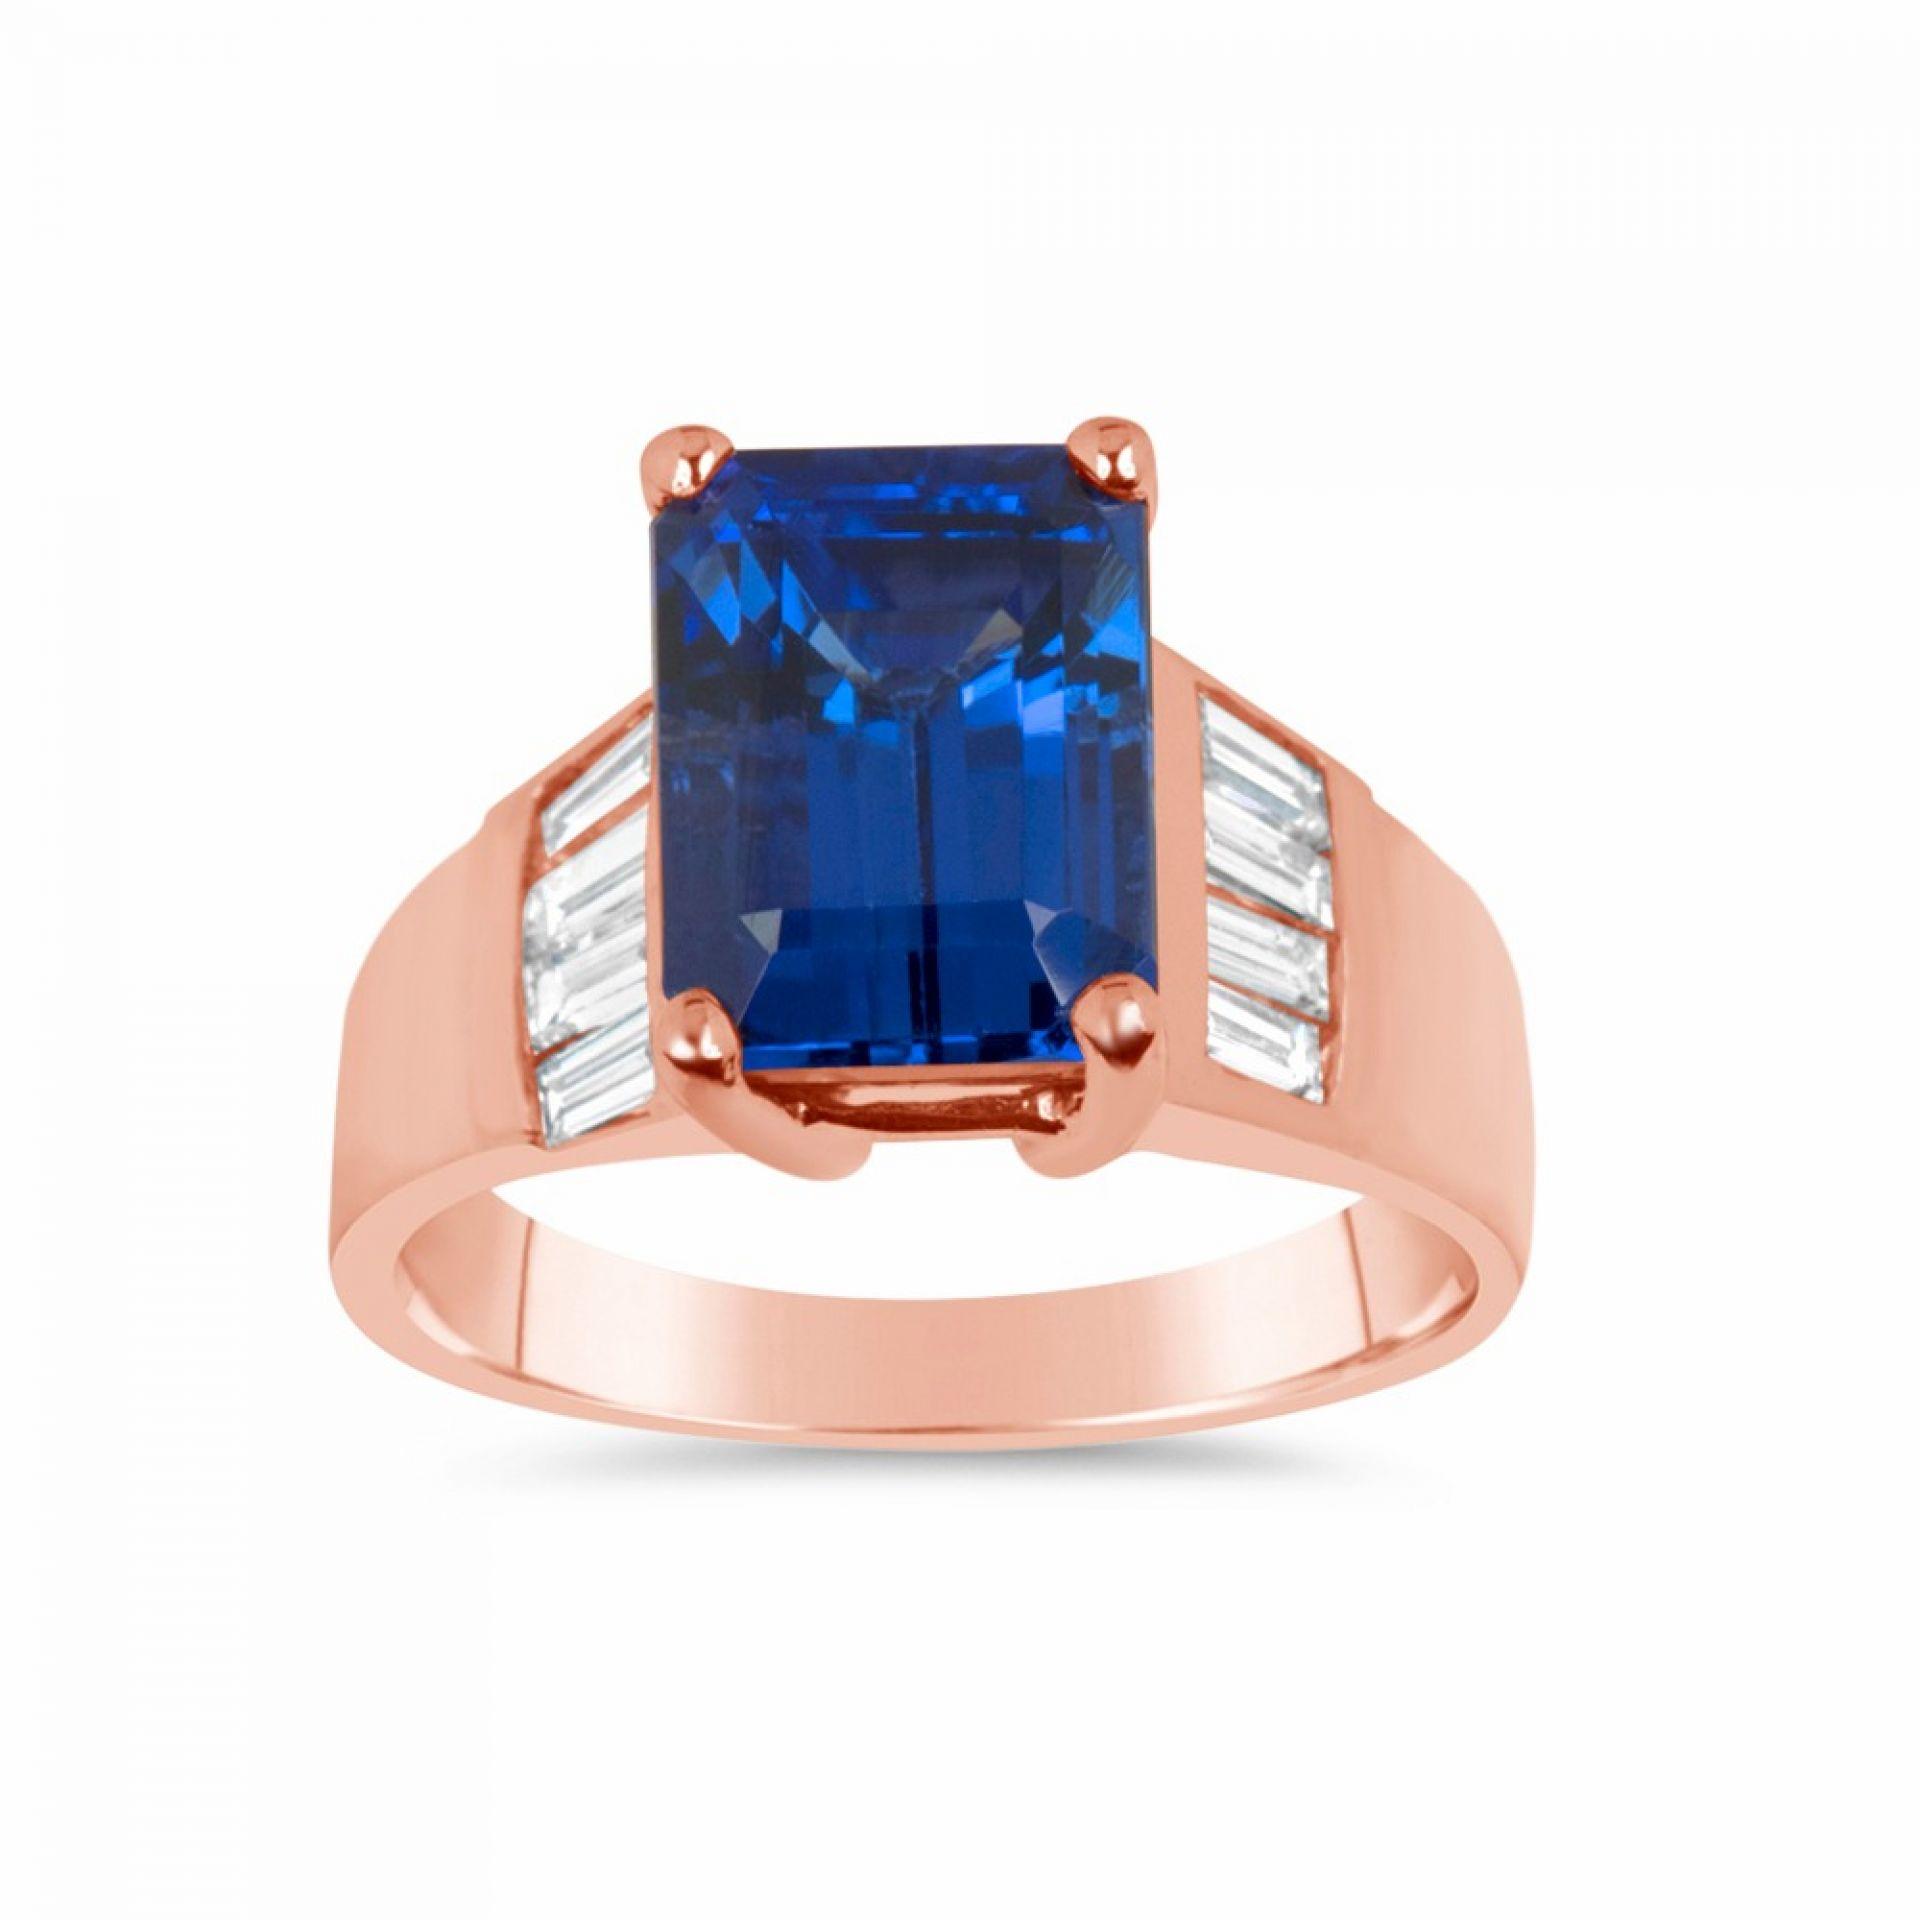 Emerald Cut Tanzanite & White Diamond Ring R103748-R